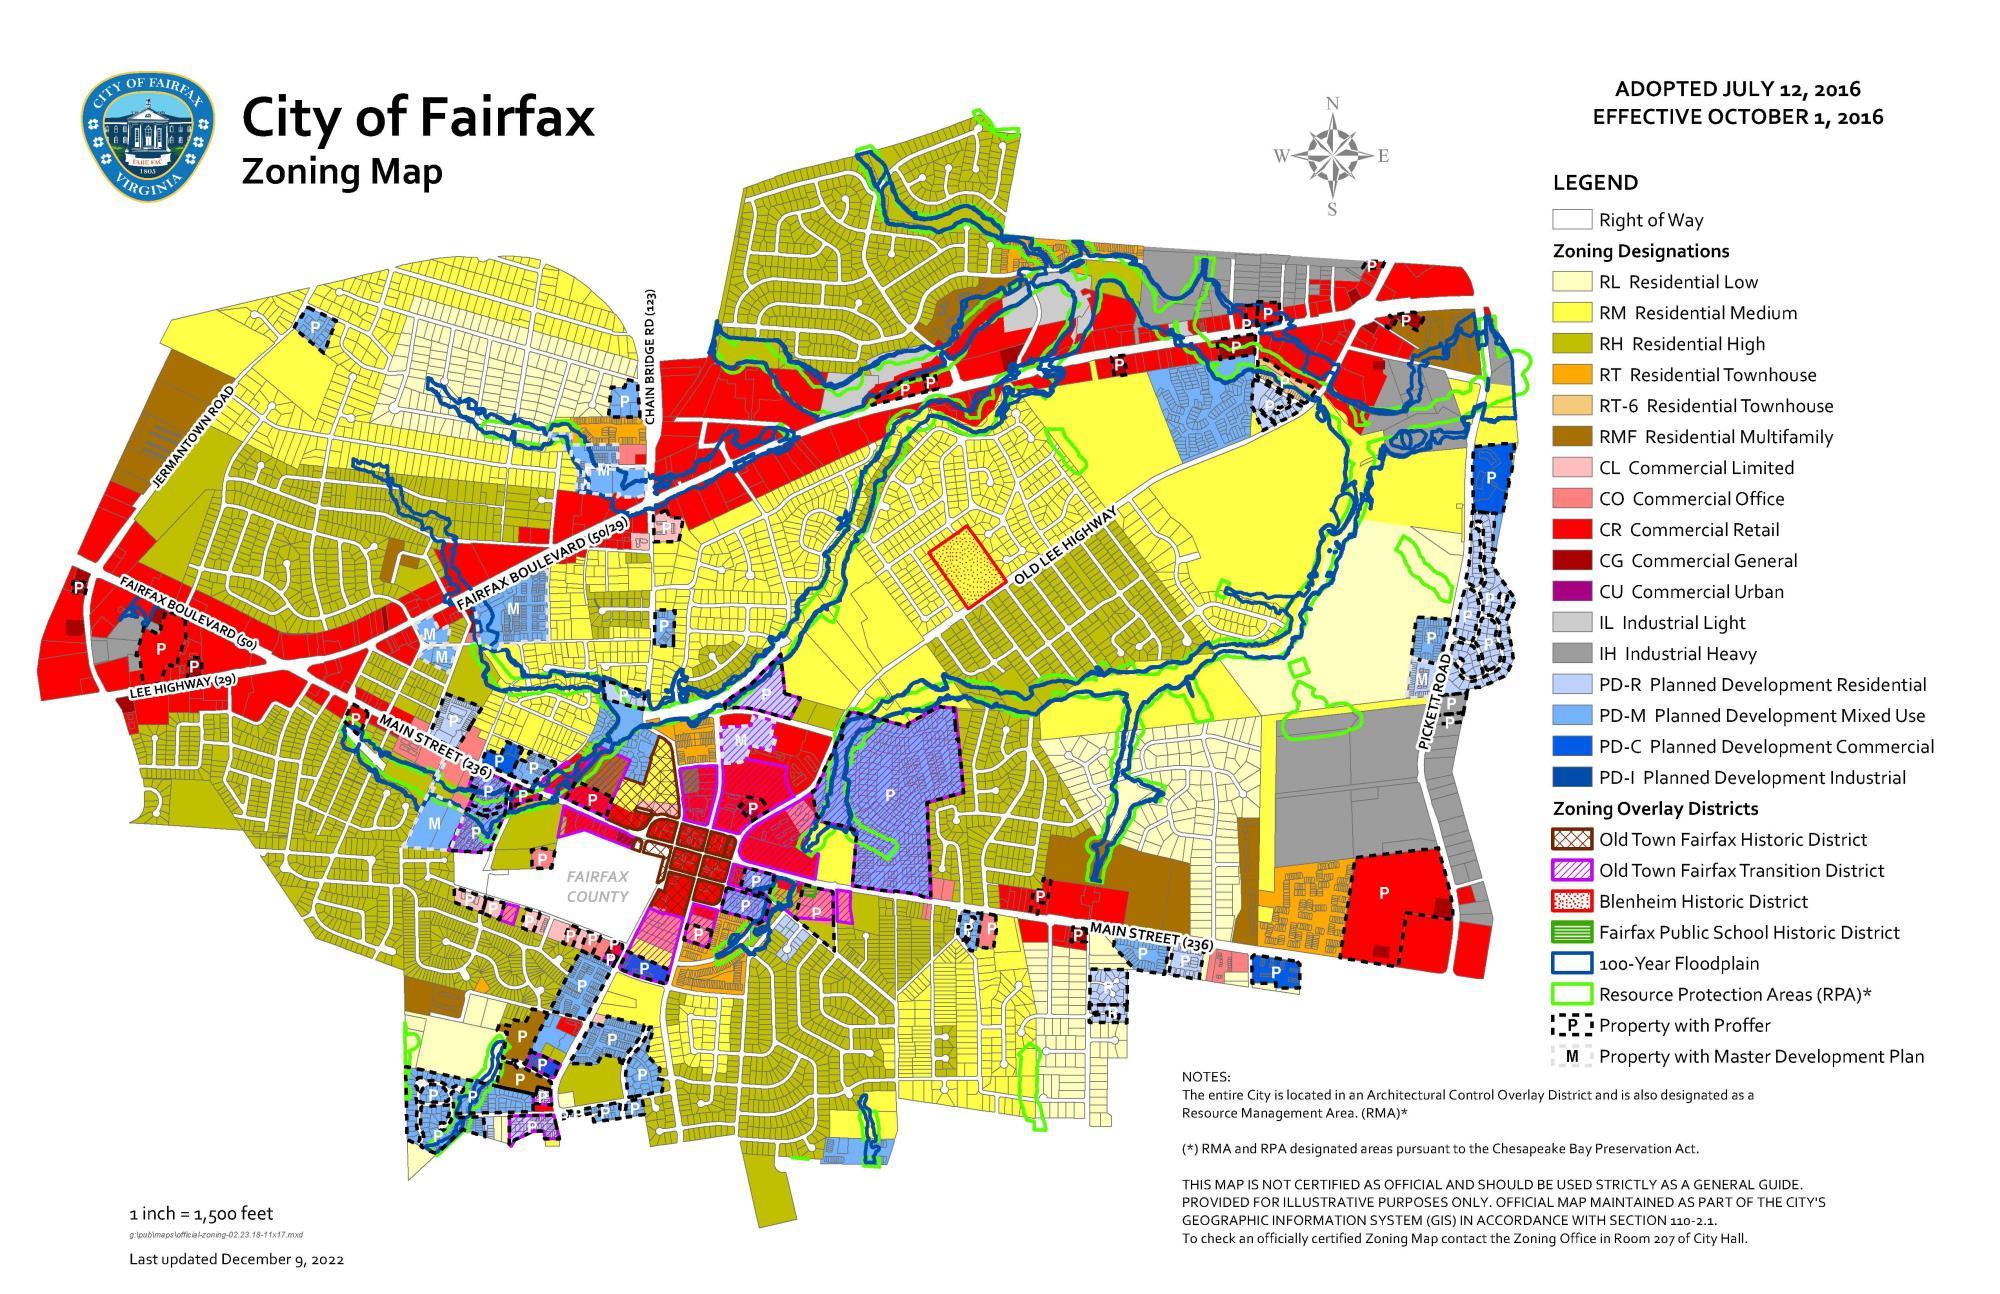 City Zoning Map Zoning Map | City of Fairfax, VA